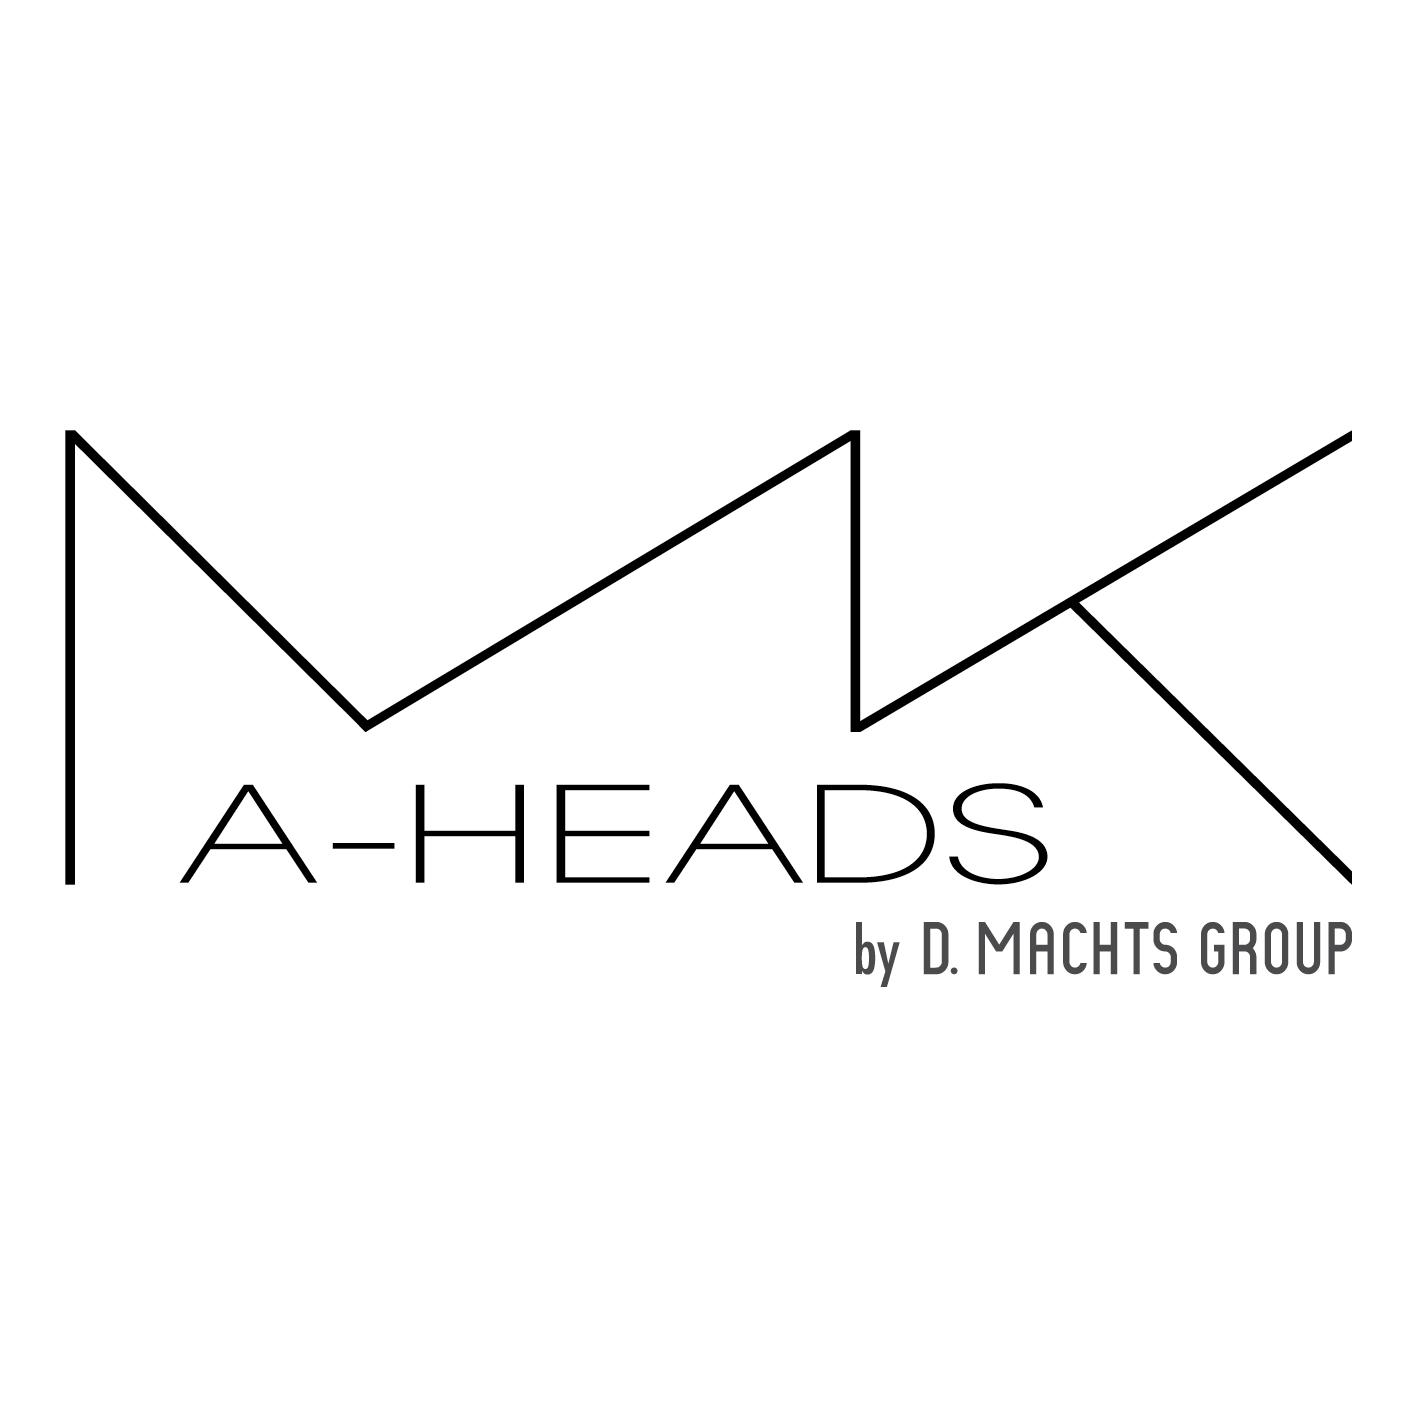 M. K. A-heads Salon